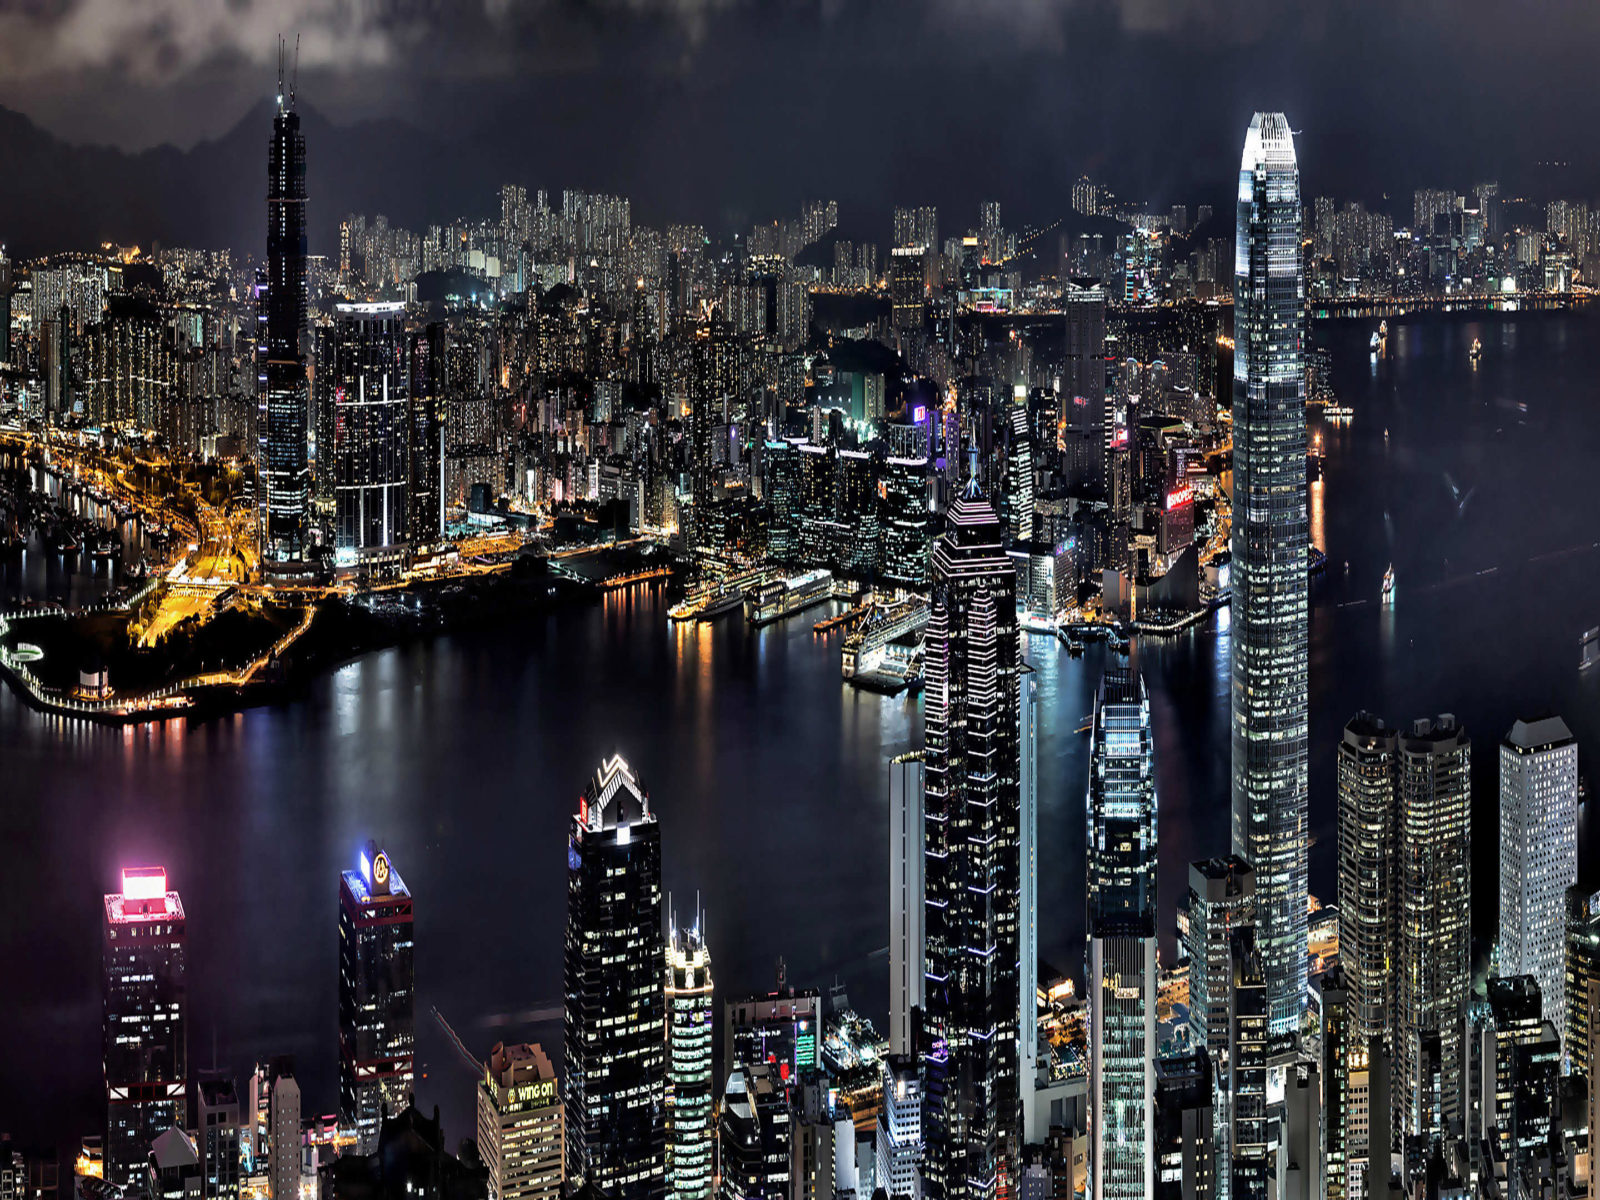 Asia-city Hong Kong in China, look at night-bay-boats, buildings, skyscrapers, night lights Wallpaper-HD-3840x2160 : Wallpapers13.com